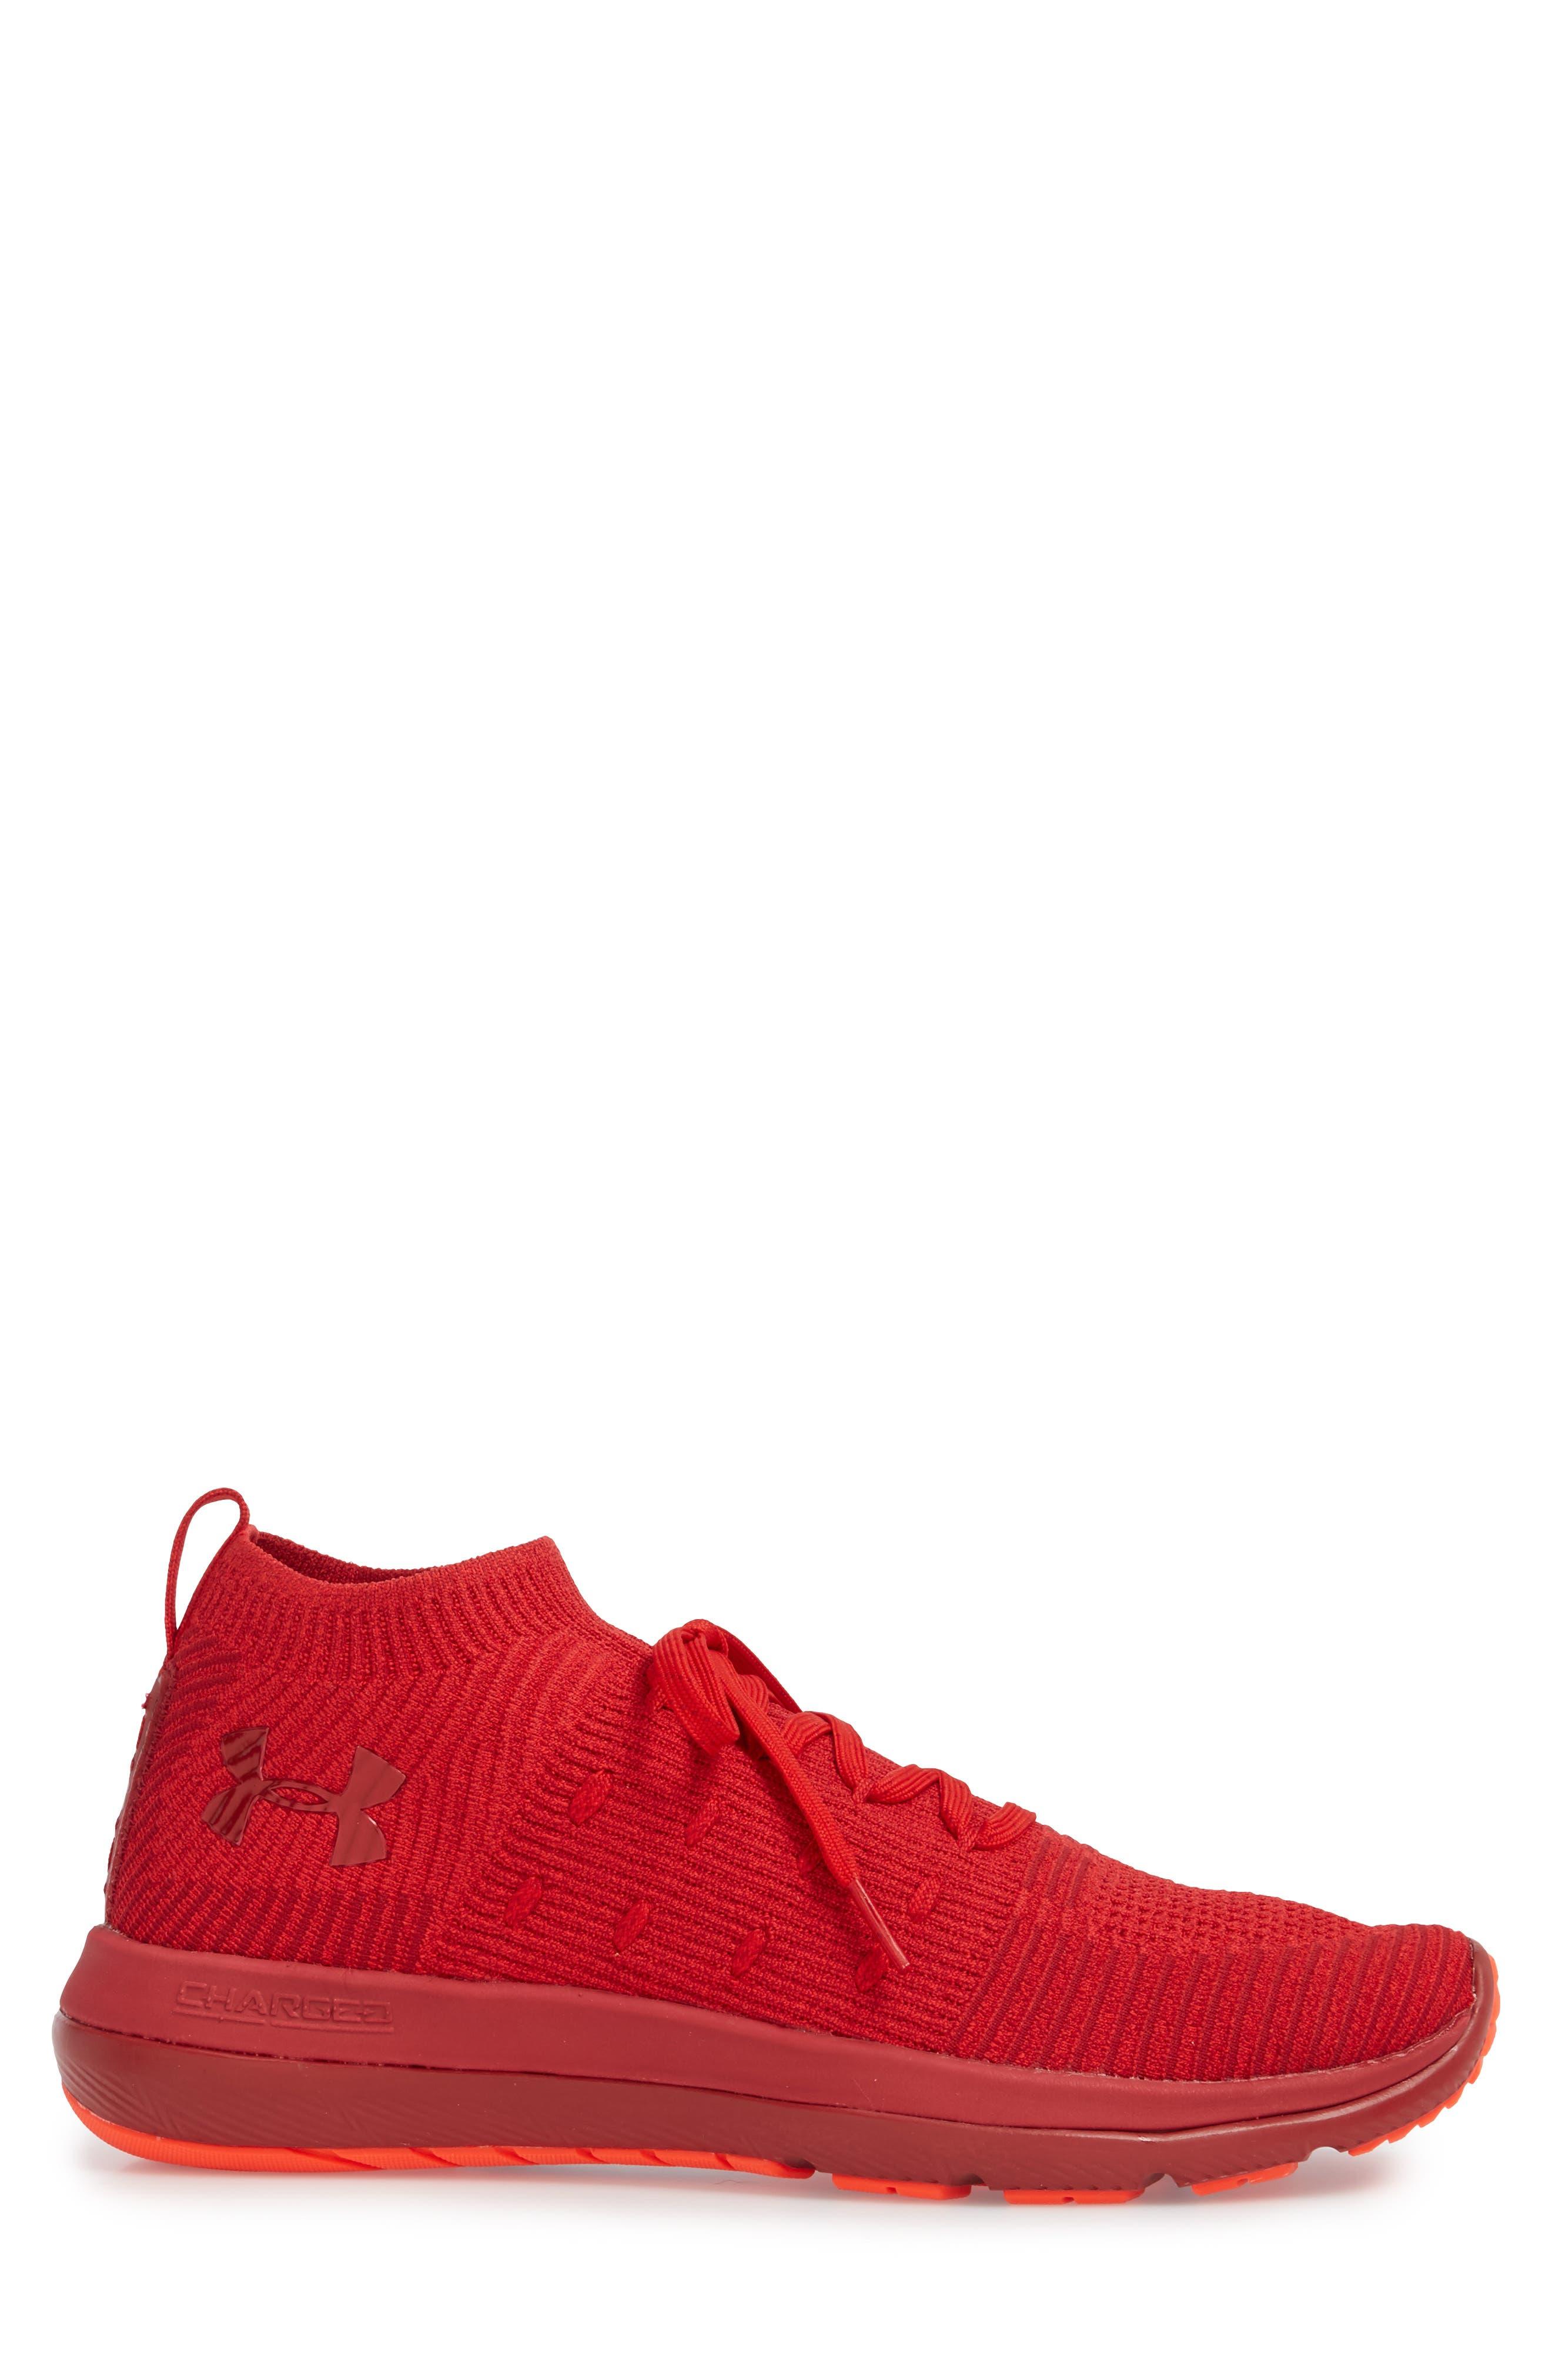 Slingflex Rise Sneaker,                             Alternate thumbnail 3, color,                             Pierce/ Spice Red